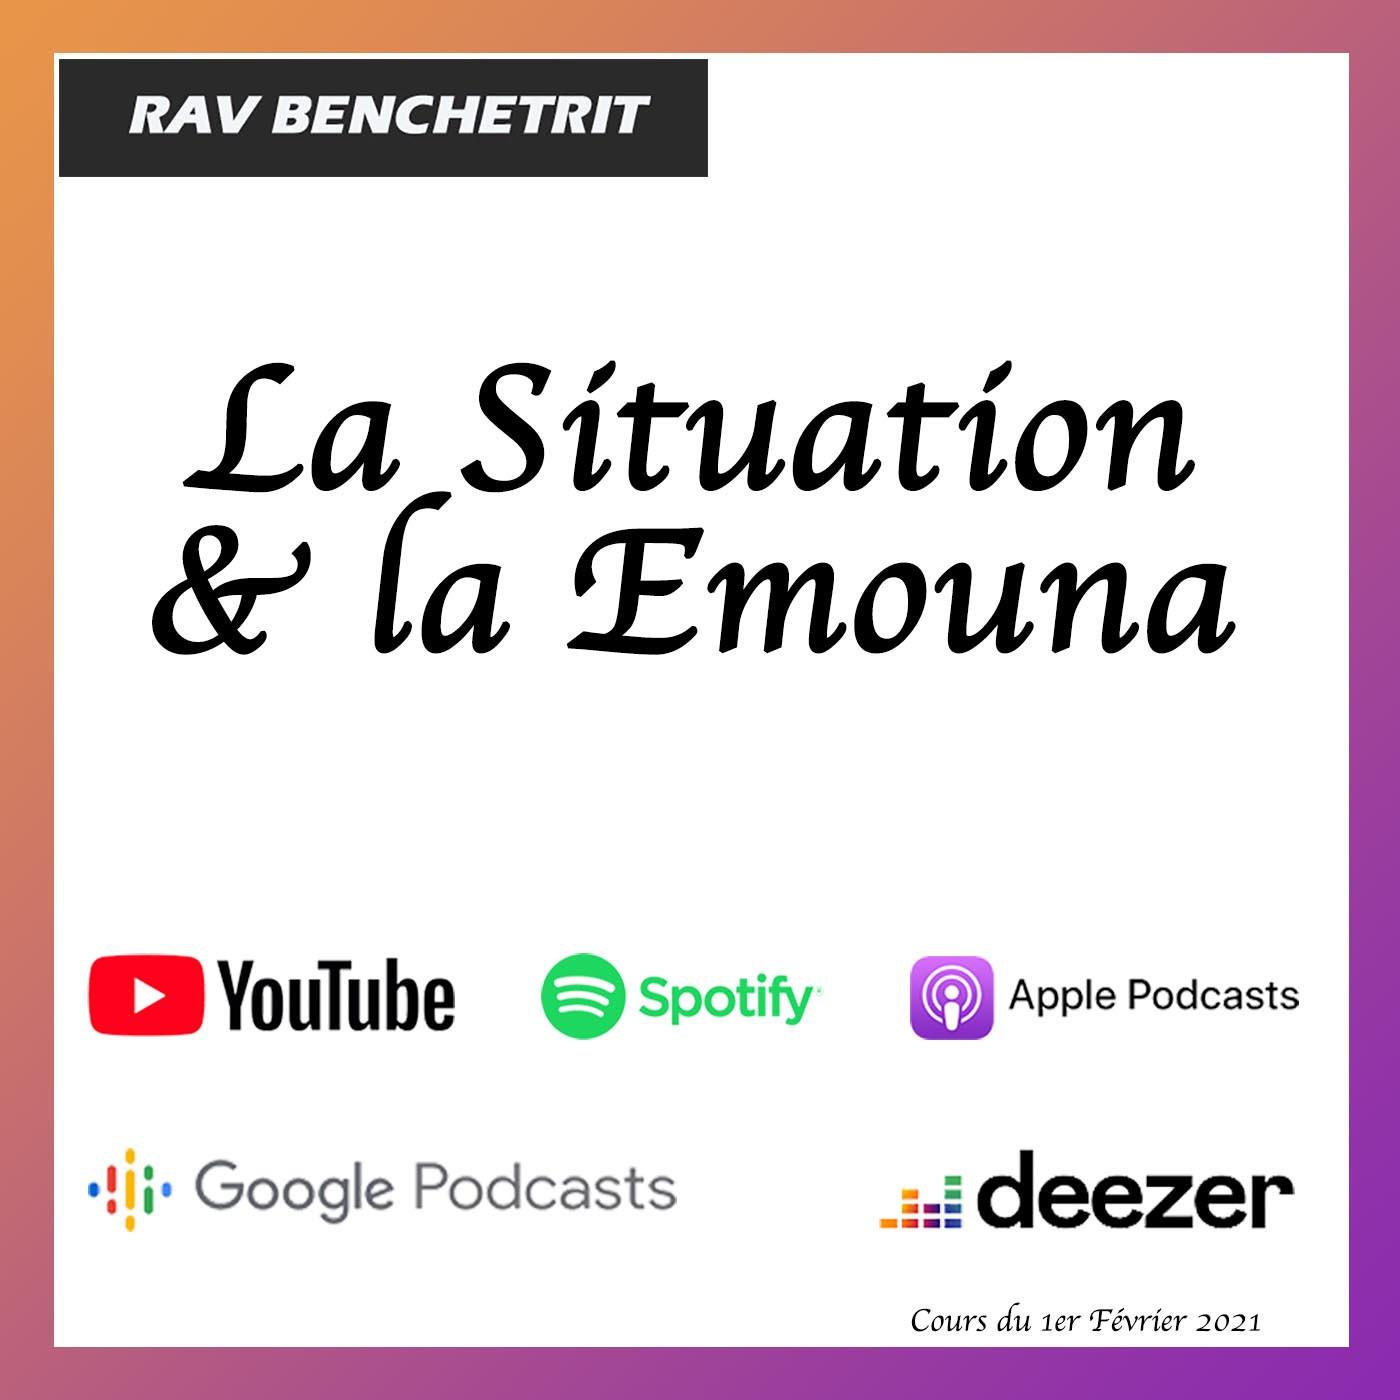 La situation et Emouna